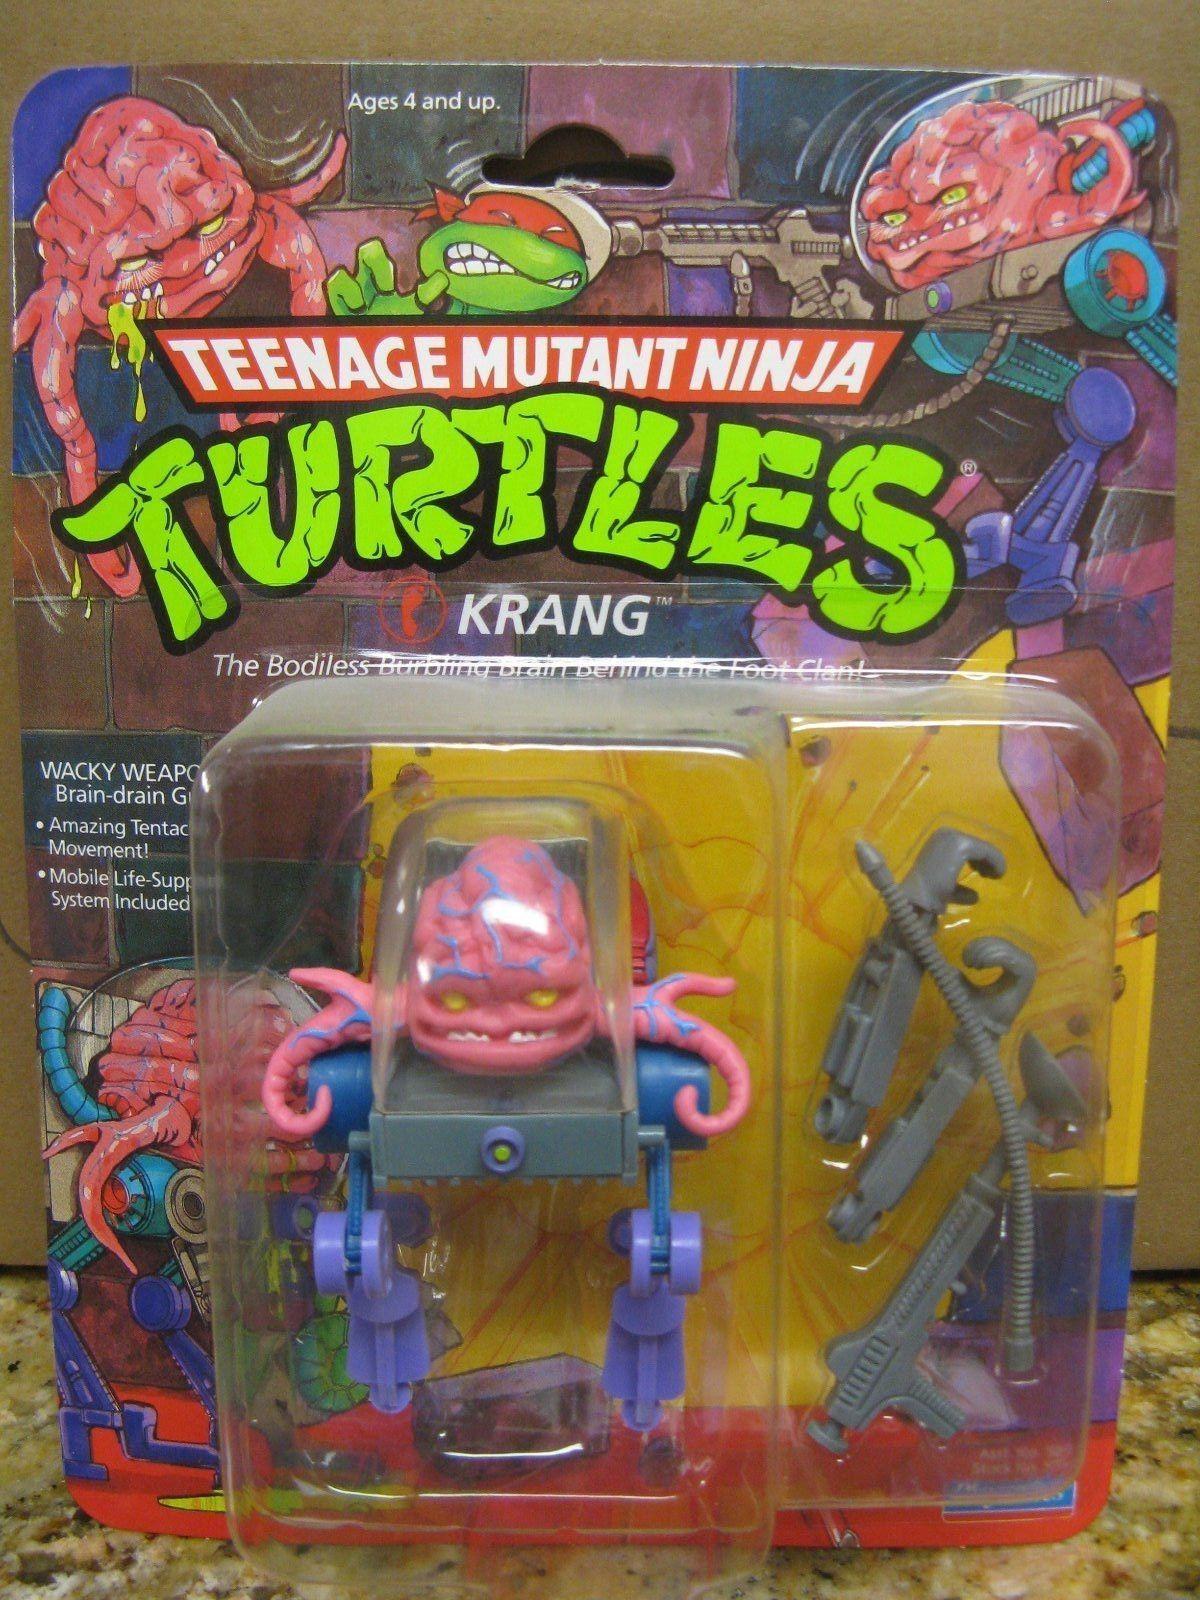 Collectible Ninja Turtle Toys